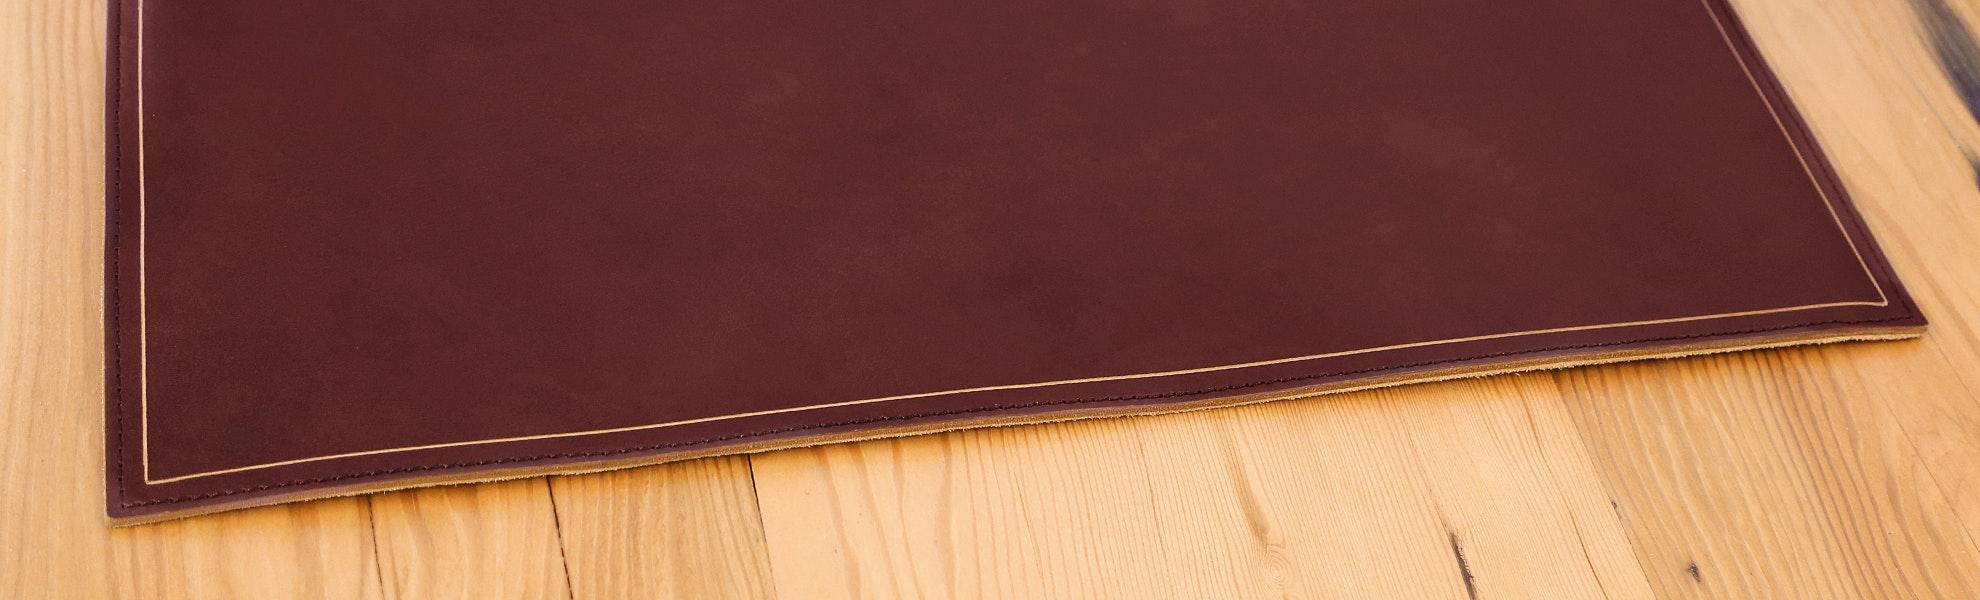 Originative Leather Desk Mat